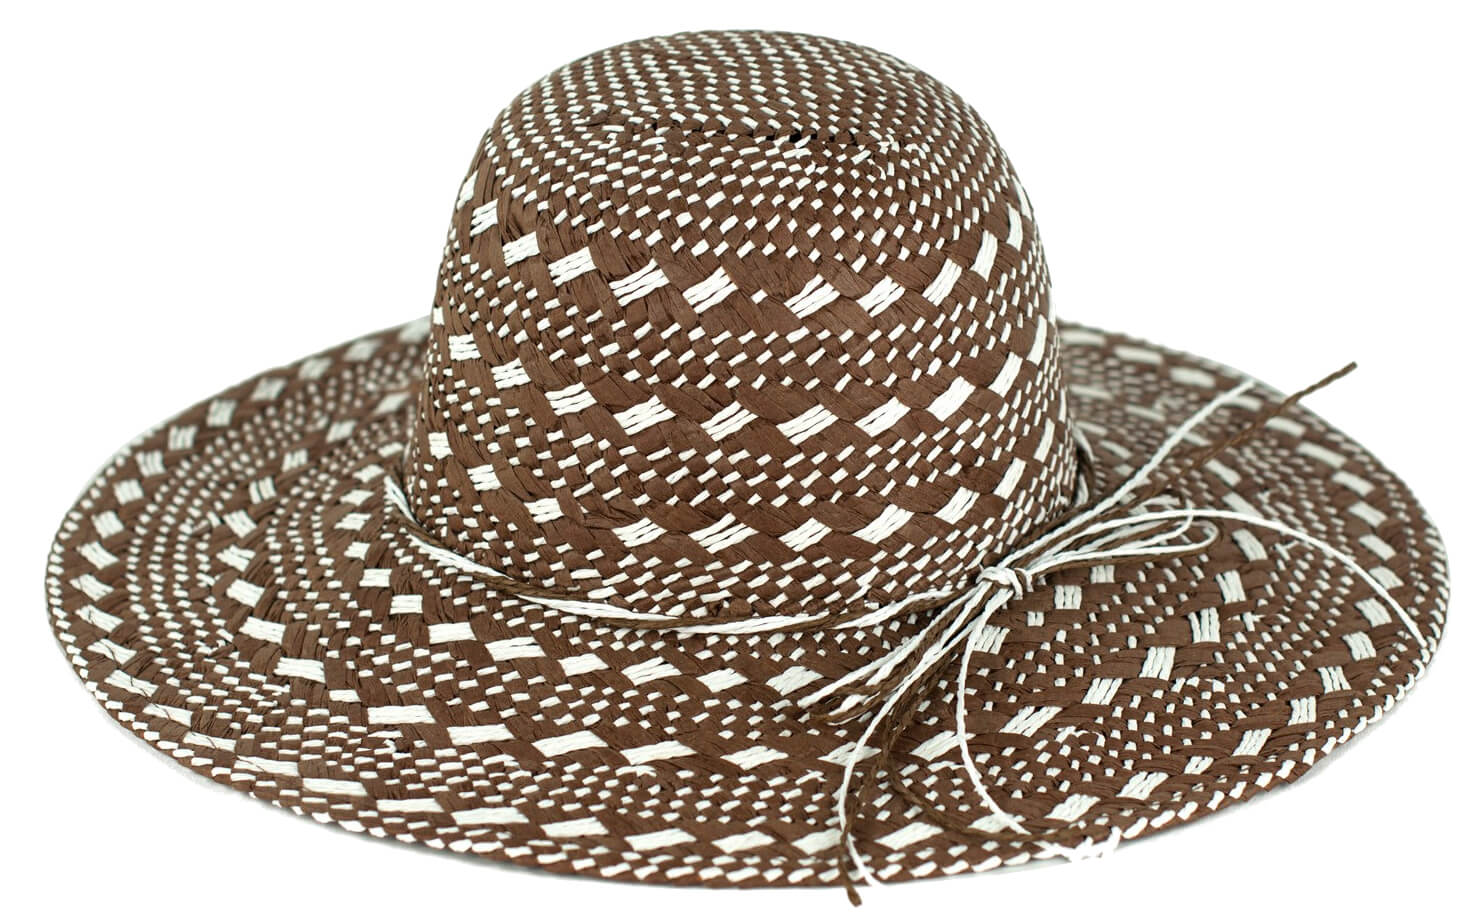 db2478884 Art of Polo Dámsky letný klobúk Fabulous cz15167 .2 | Vivantis.sk